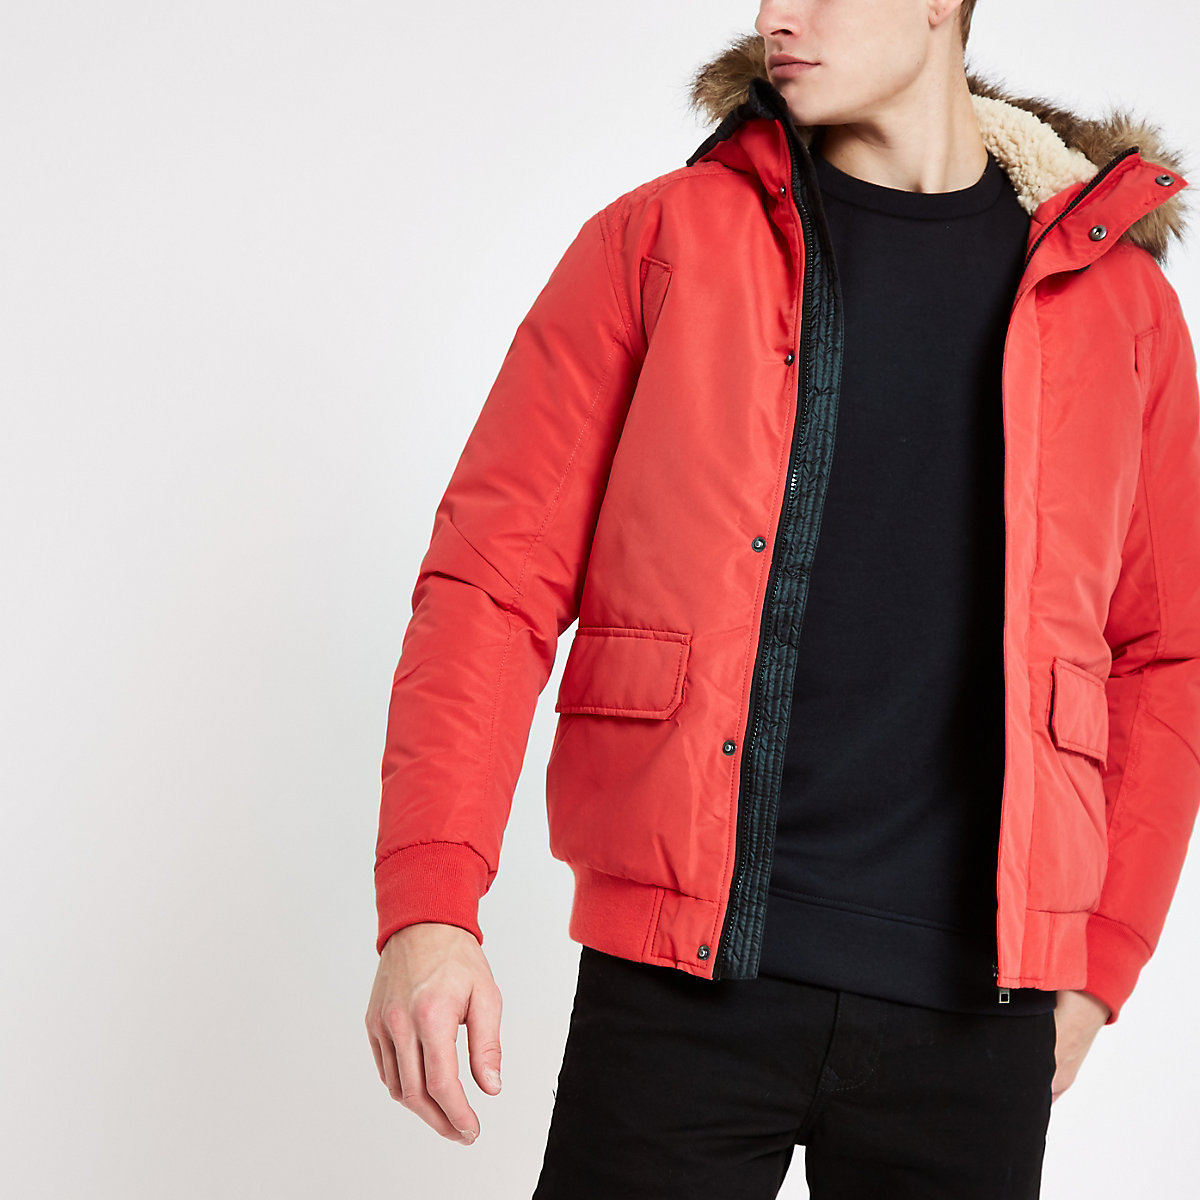 Jack & Jones red faux fur bomber jacket